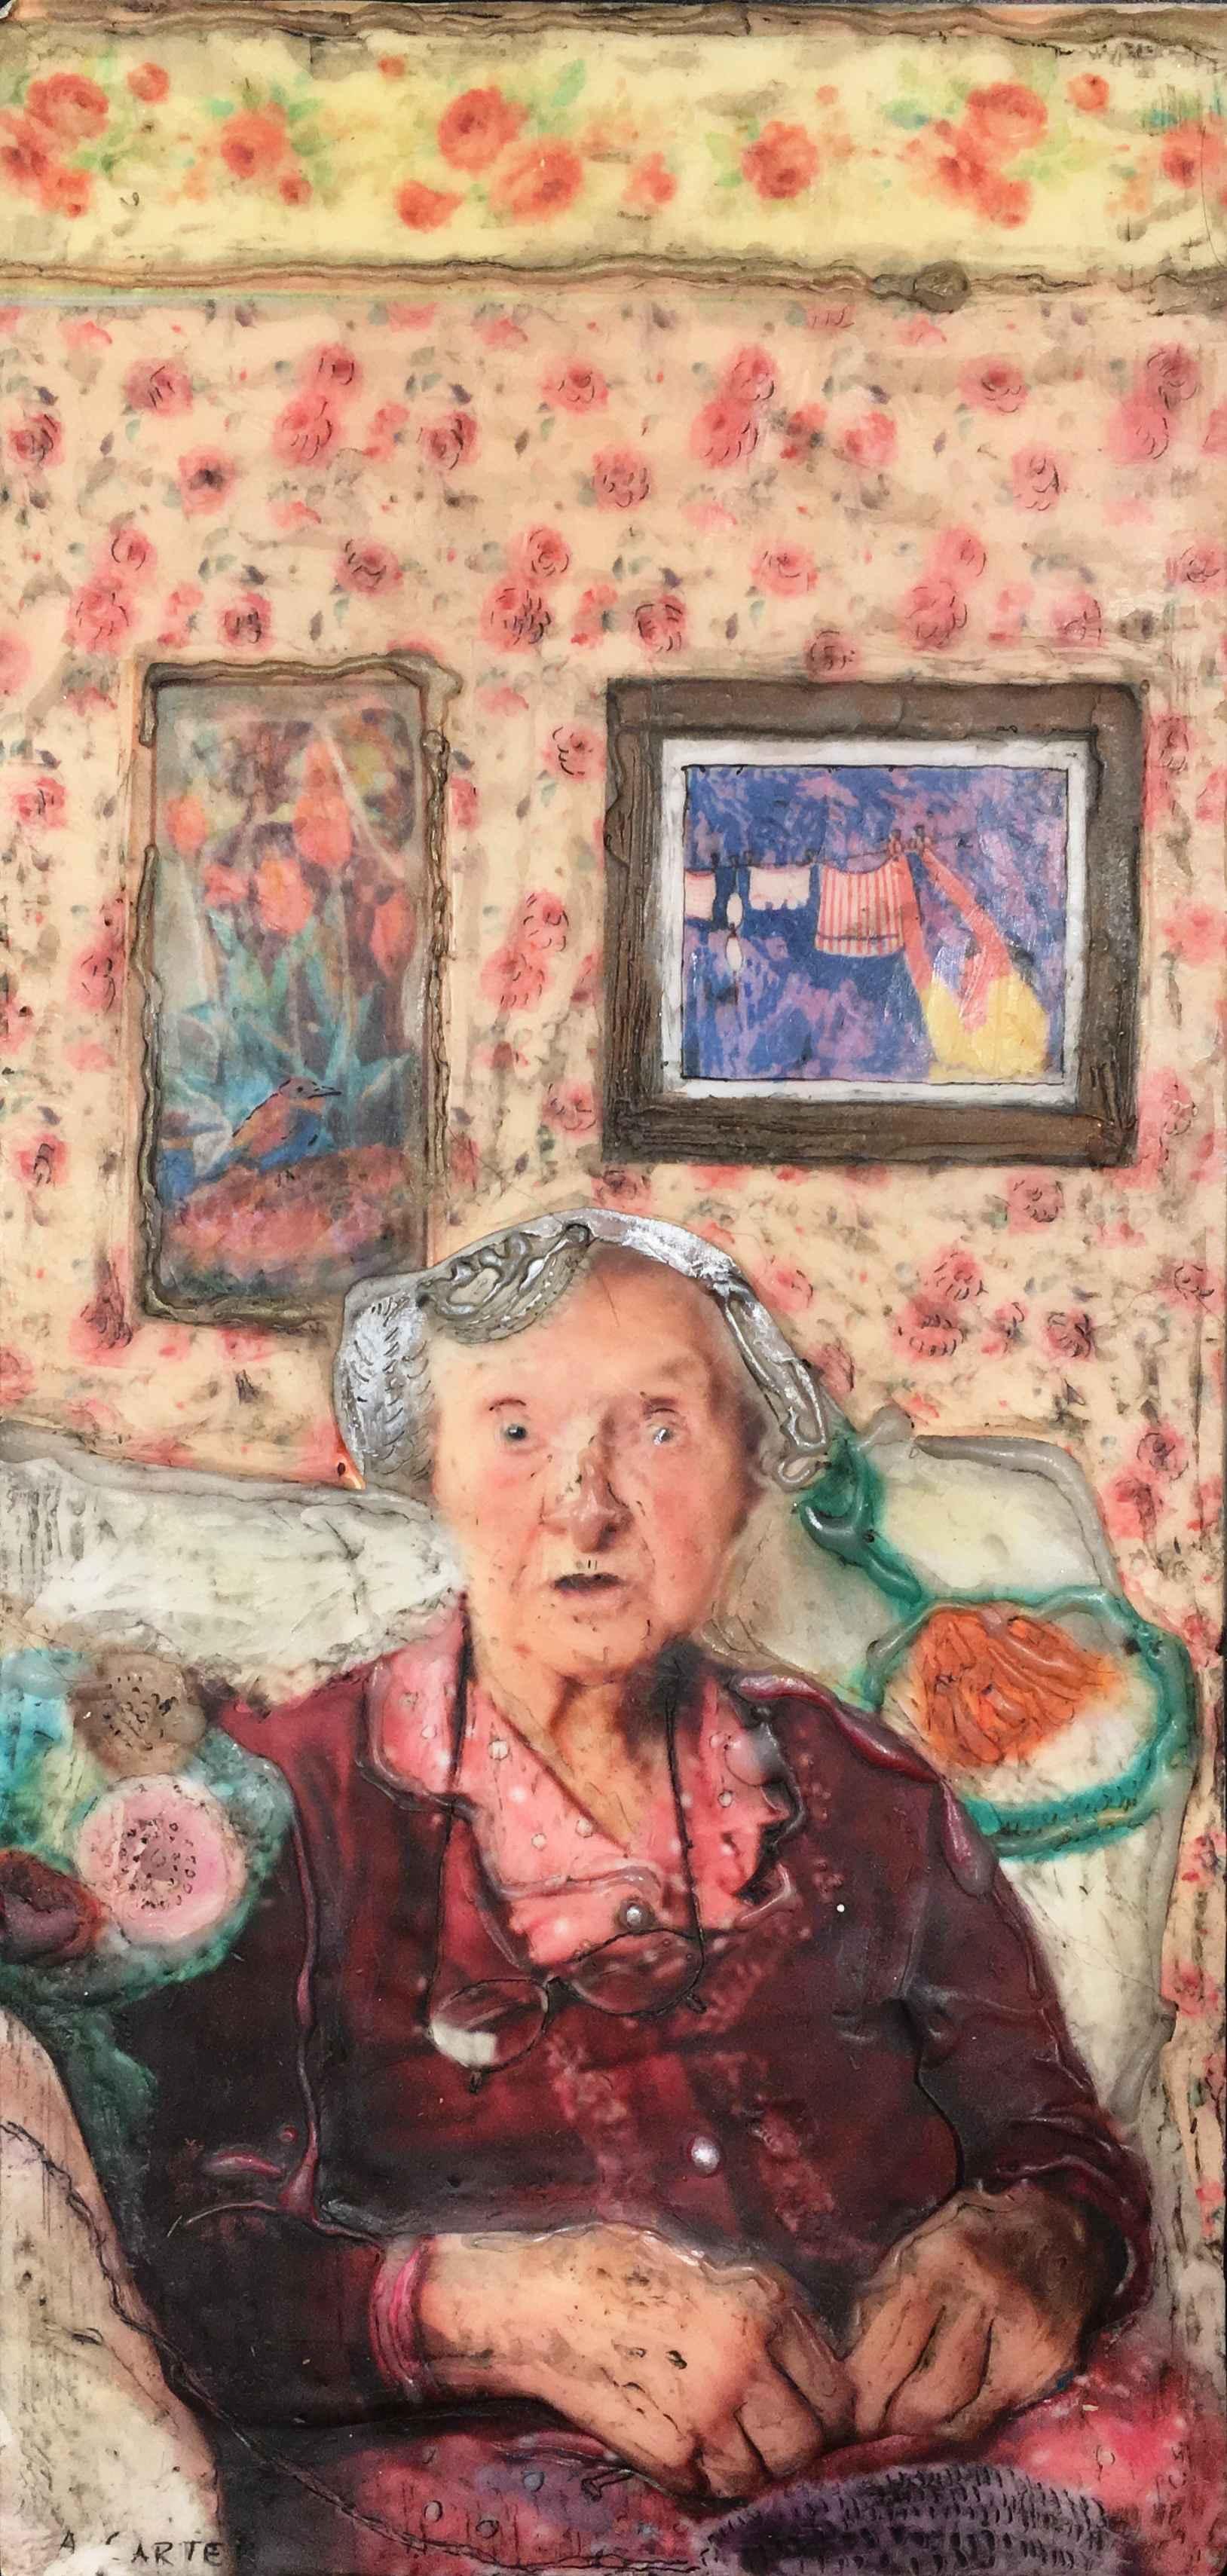 Ethel Explains Her Te... by  Ann L. Carter - Masterpiece Online